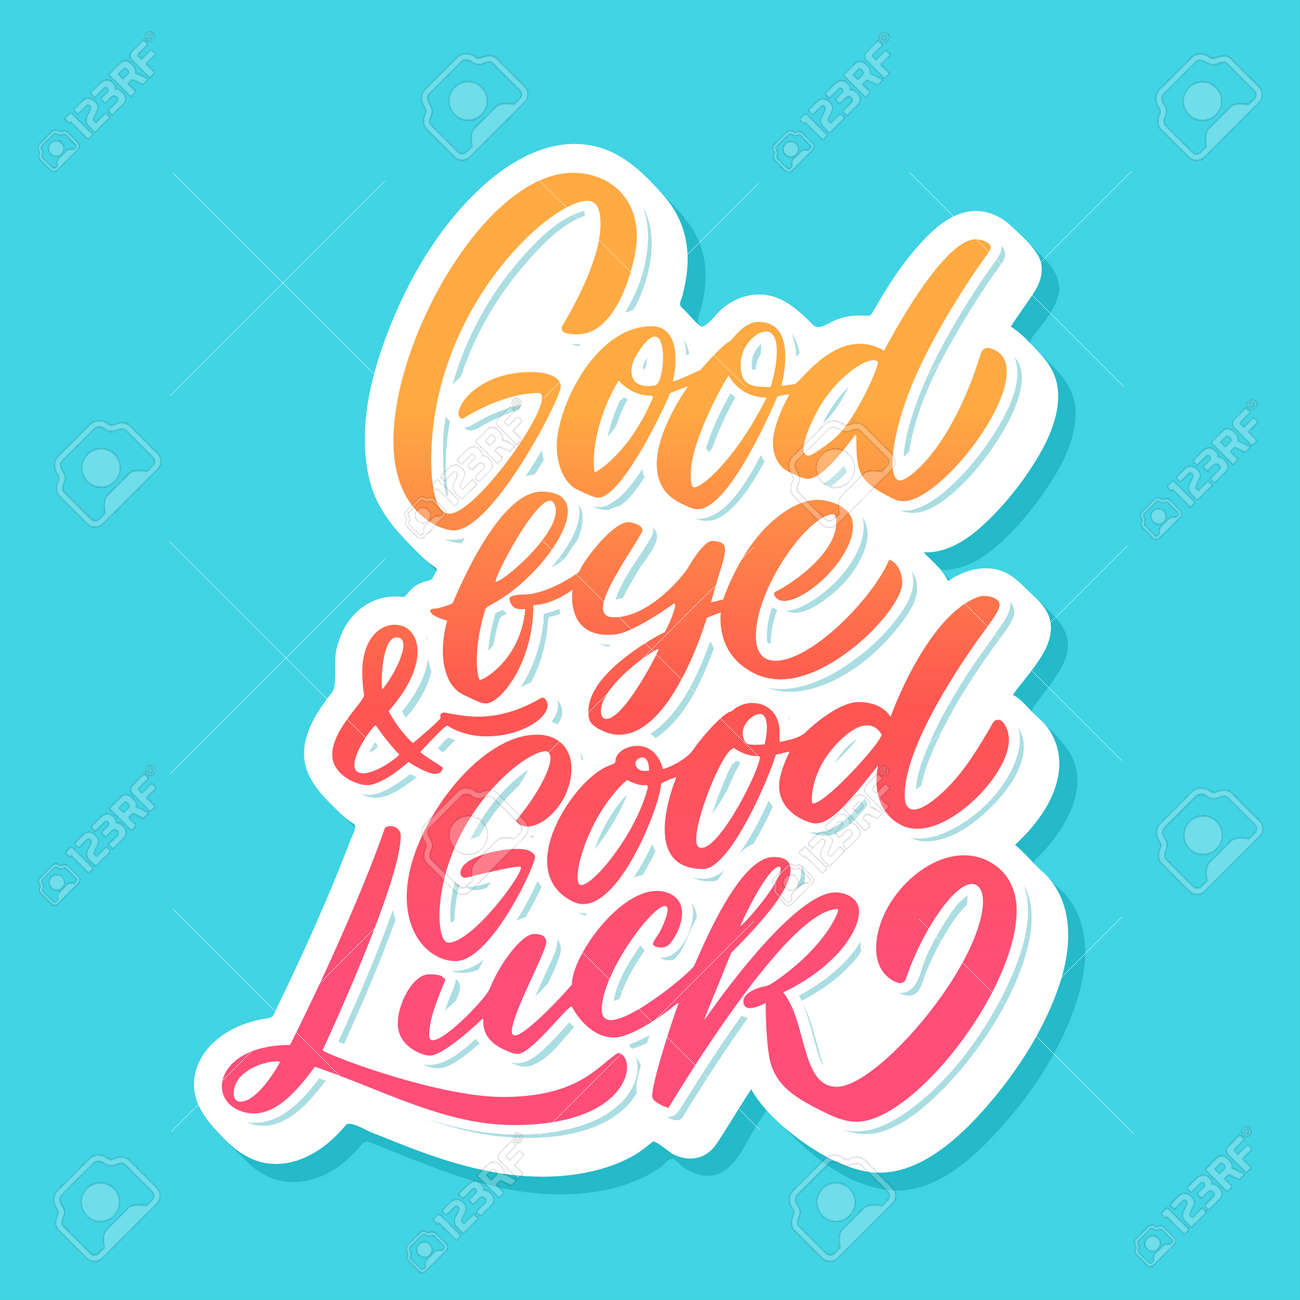 Goodbye and Good luck. Farewell card. - 104587209